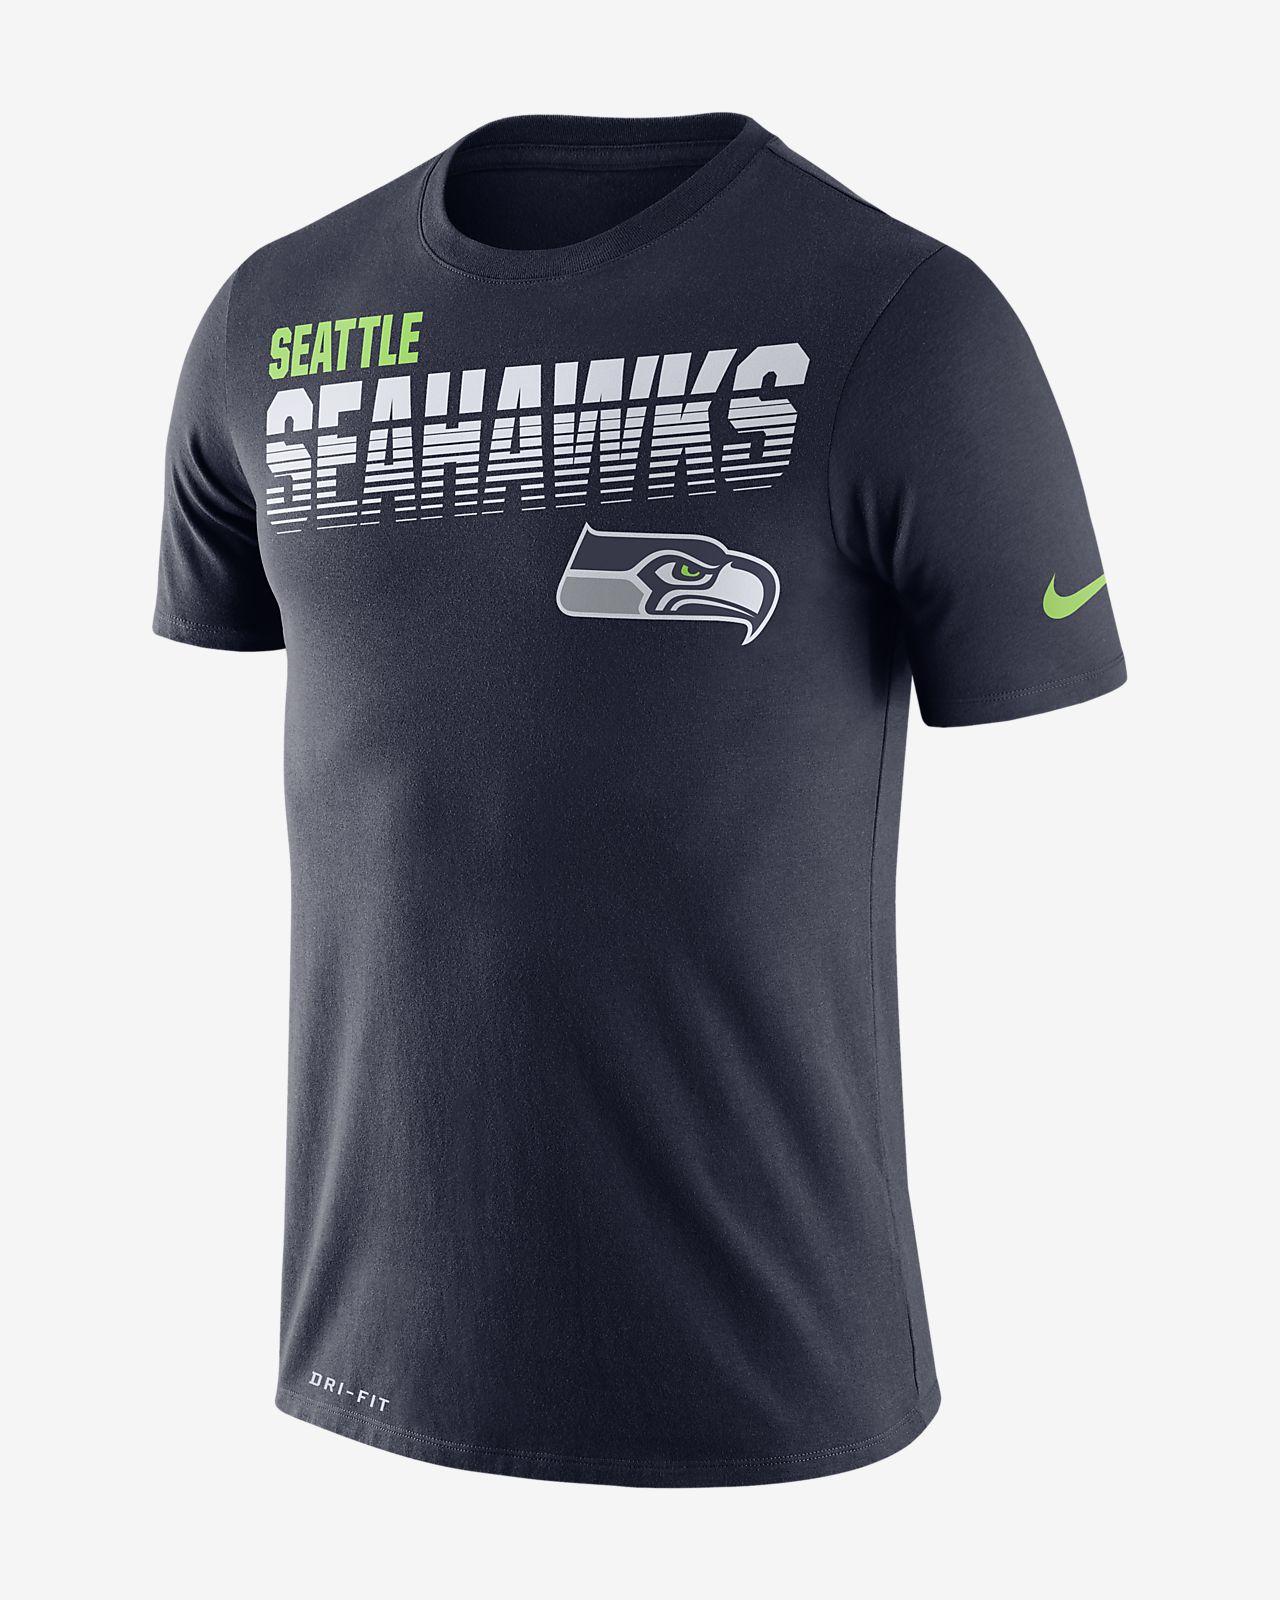 Nike Legend (NFL Seahawks) Men's Short-Sleeve T-Shirt